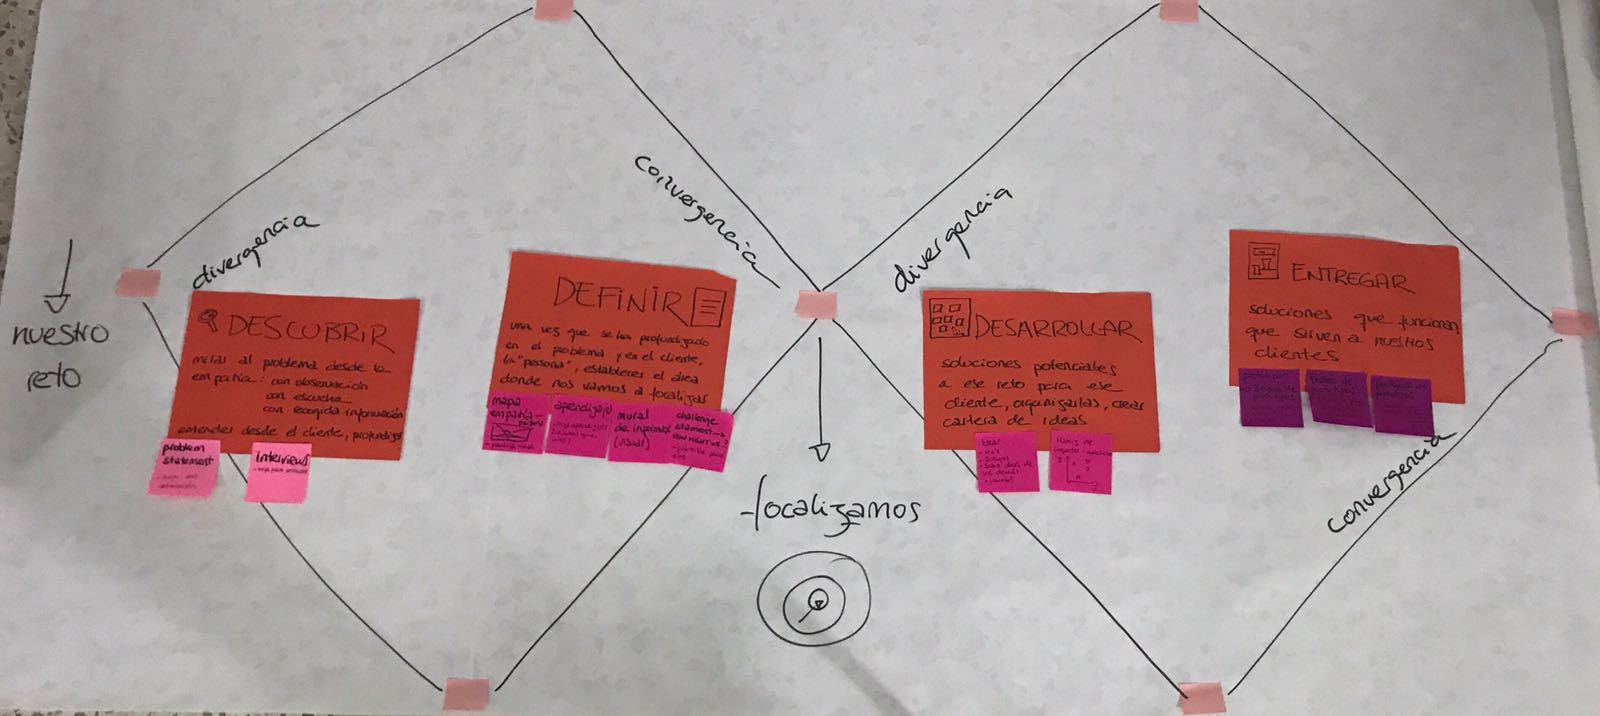 esquema completo design thinking